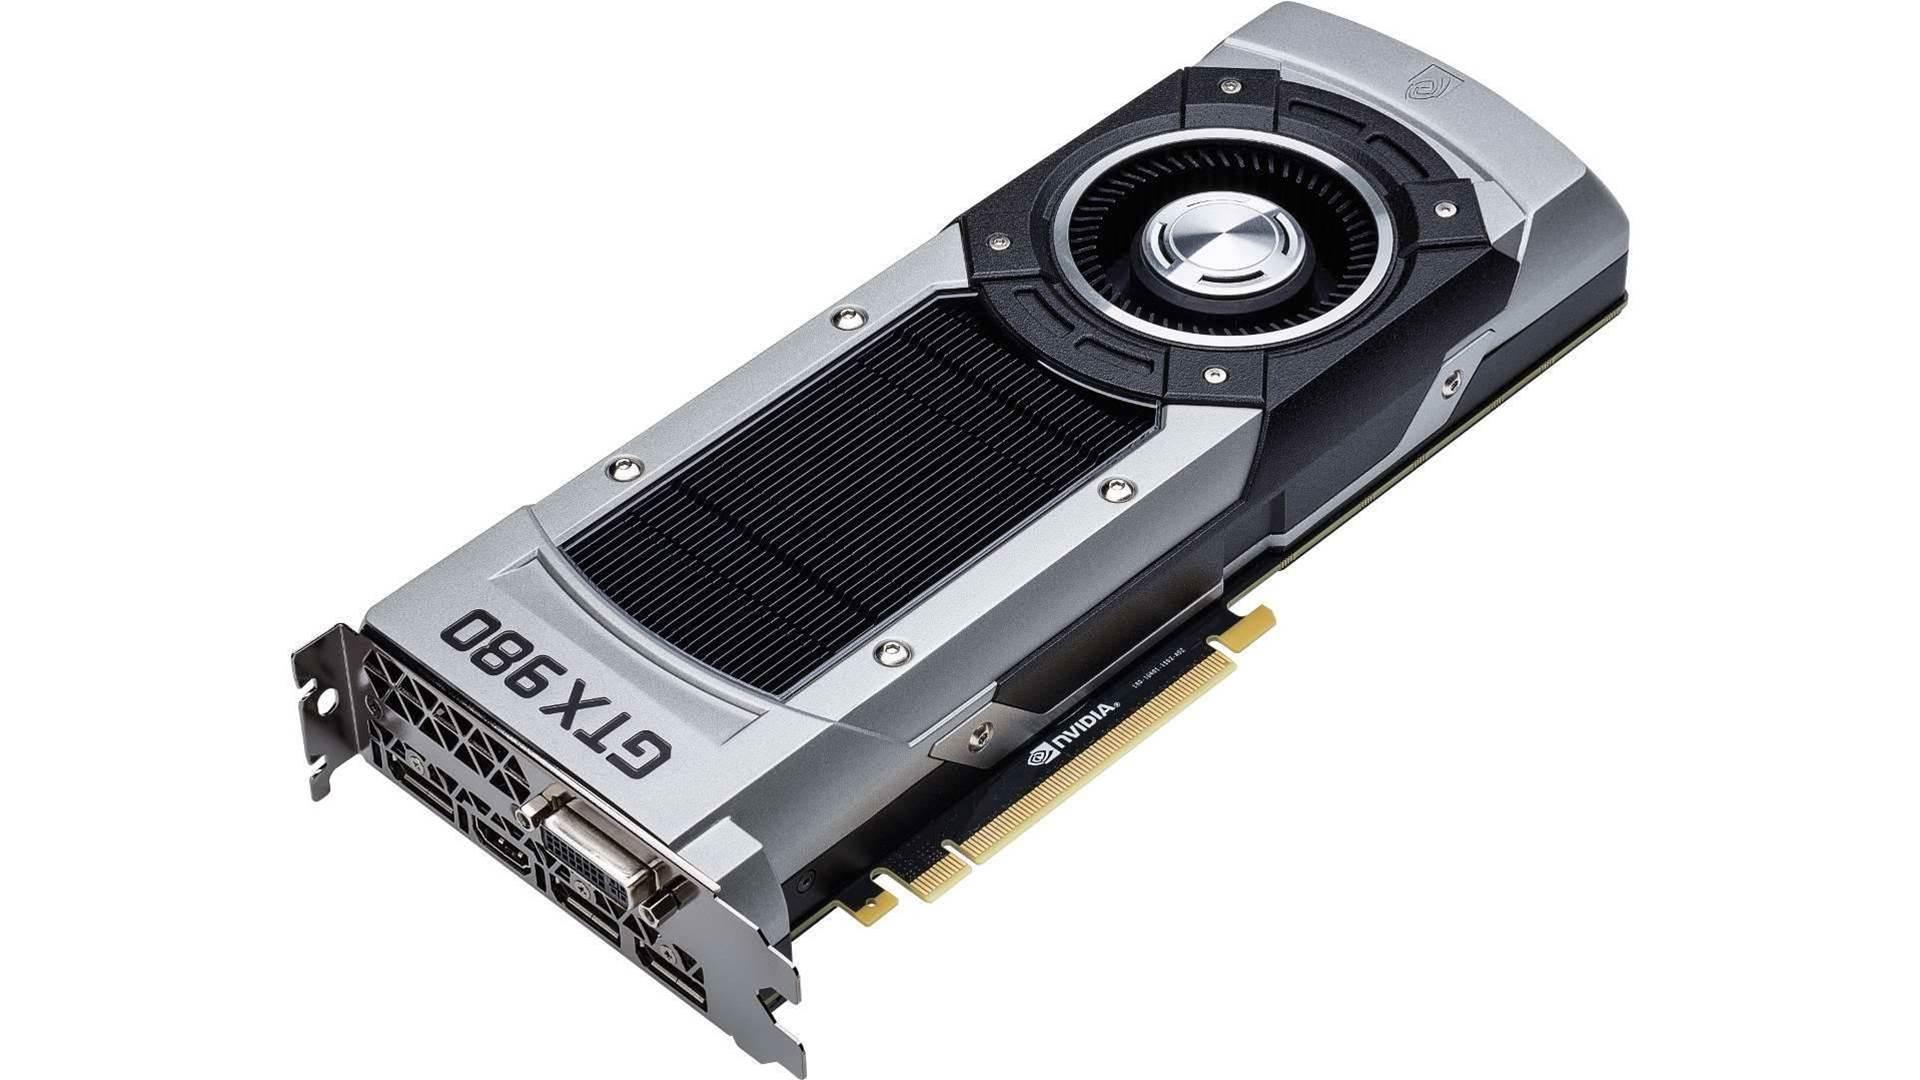 NVIDIA launches super efficient GTX 980 and GTX 970